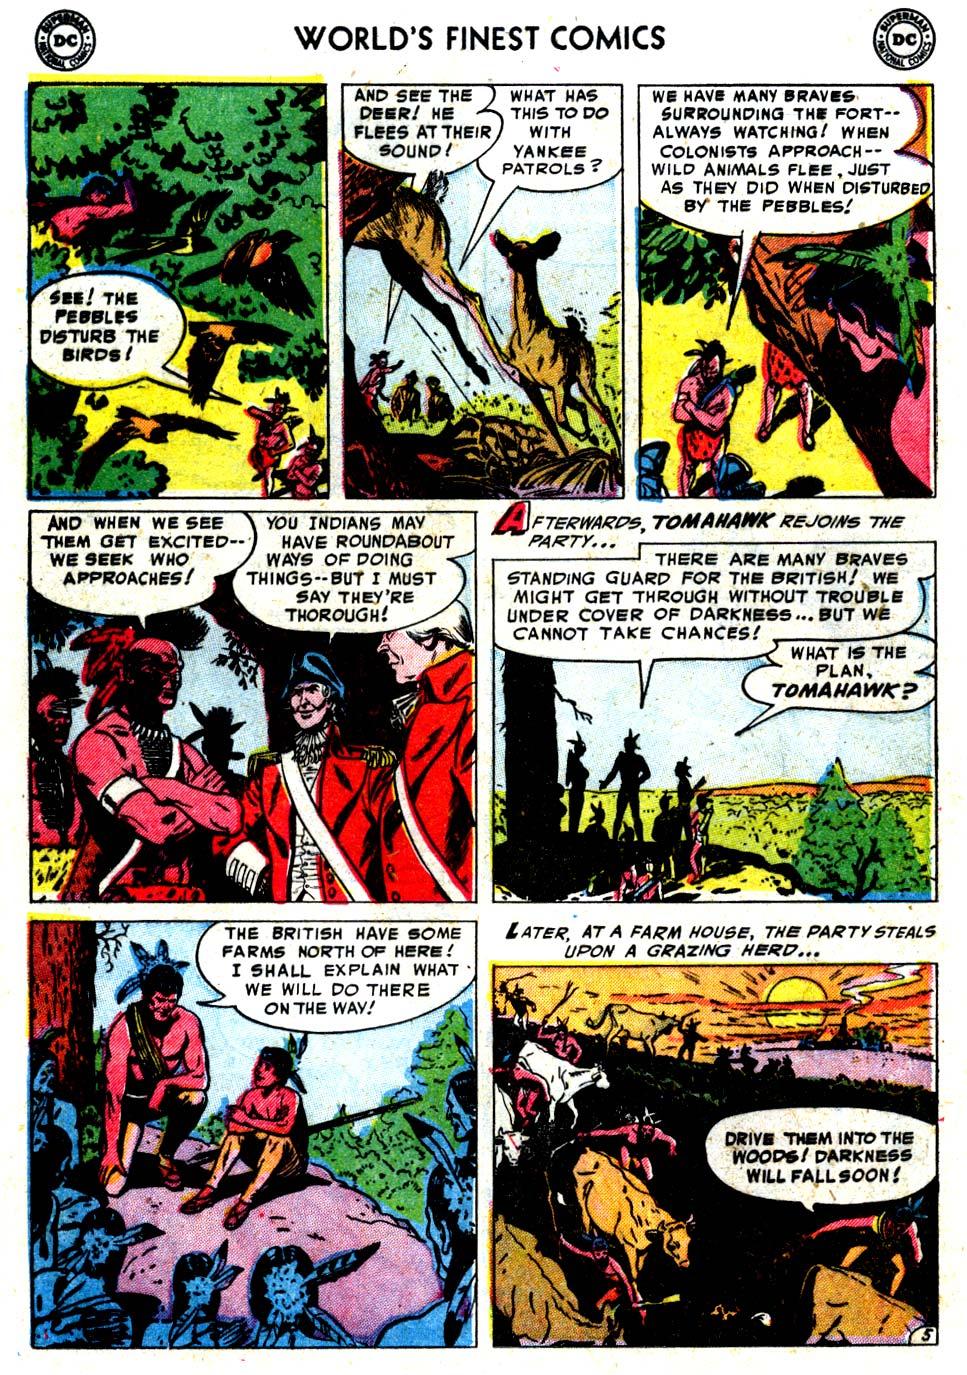 Read online World's Finest Comics comic -  Issue #68 - 20